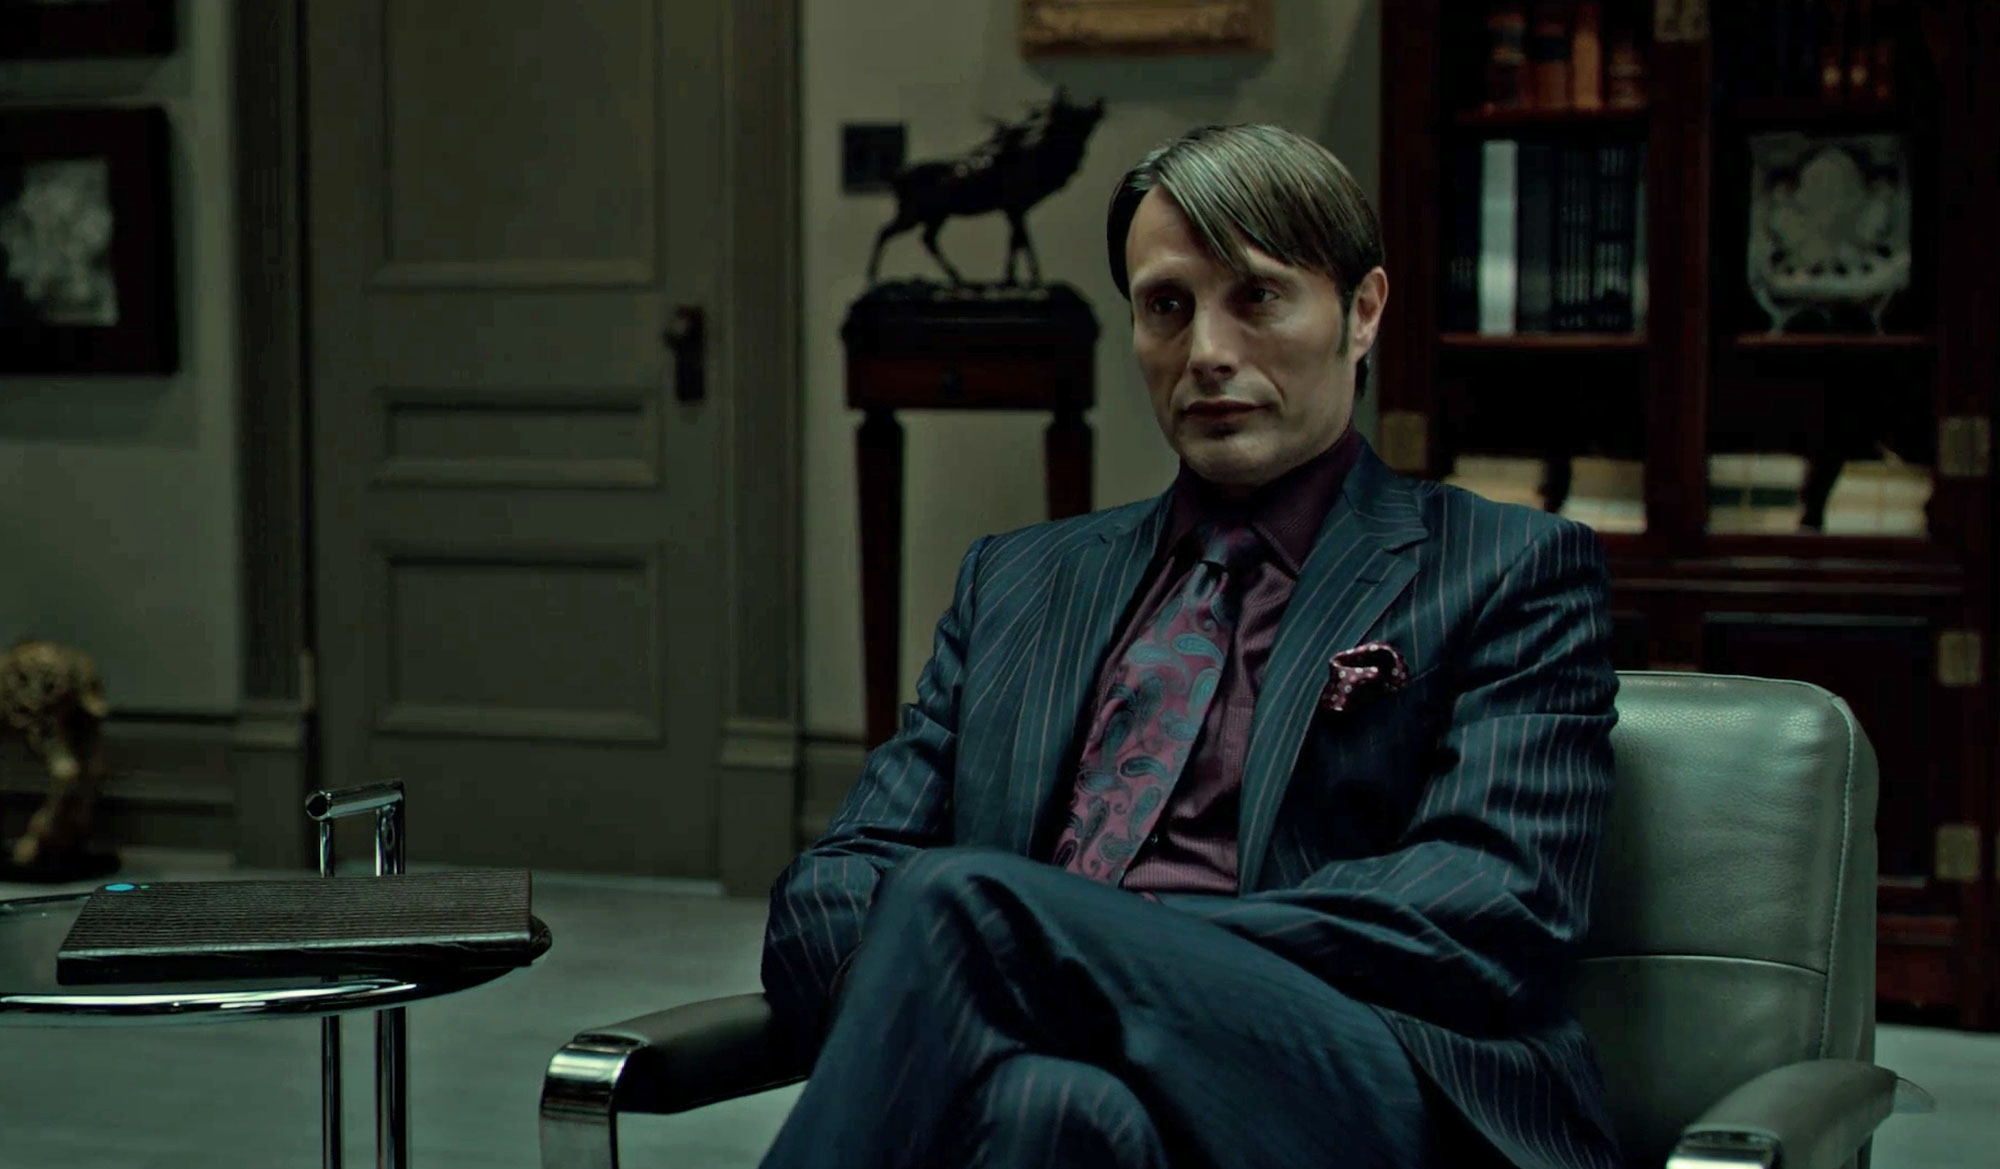 pocket square folds Hannibal sitting down